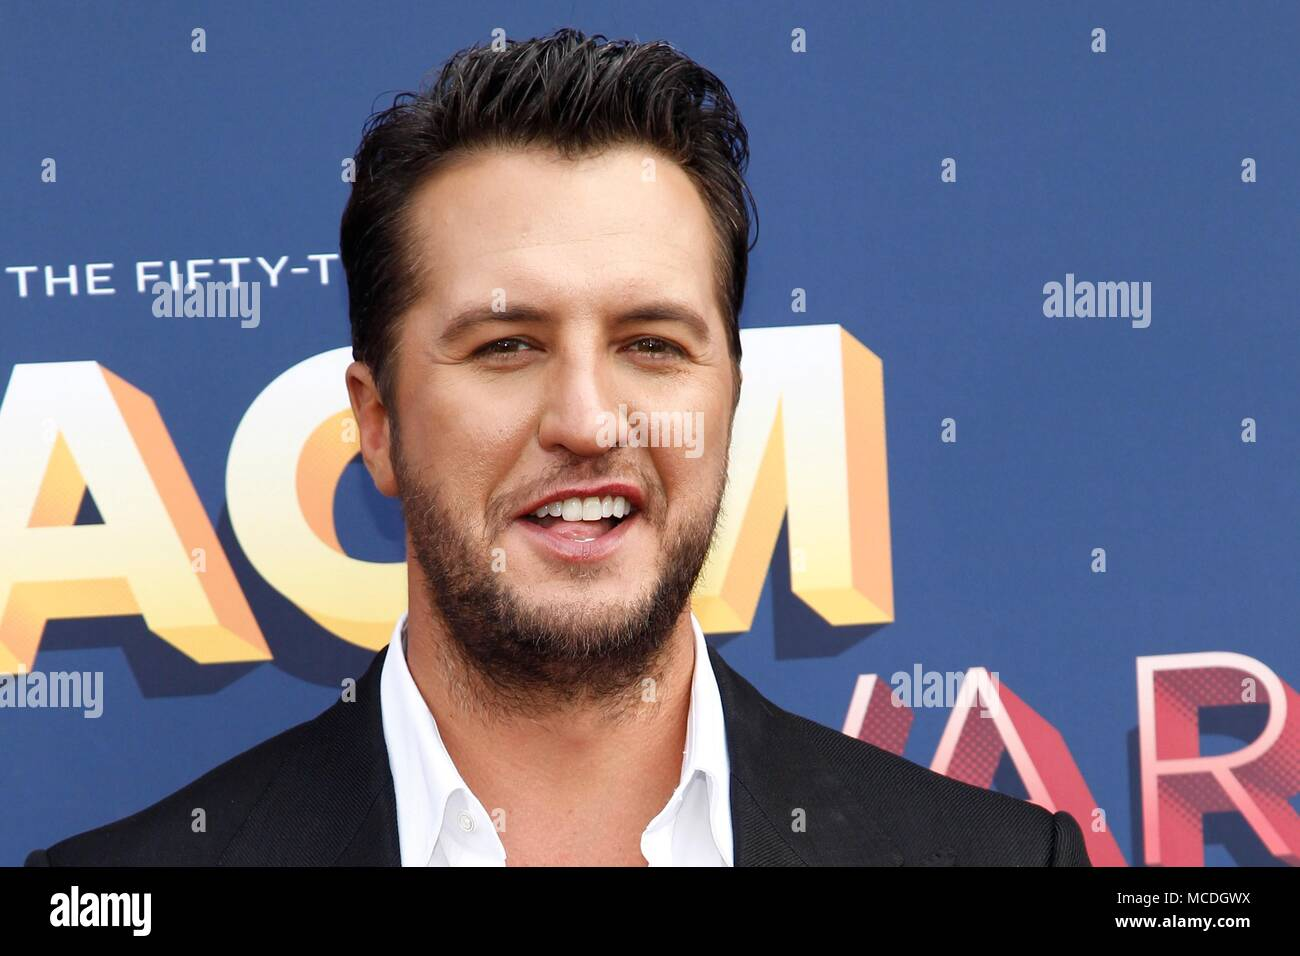 Acm Acms Academy Of Country Music Awards Stock Photos & Acm